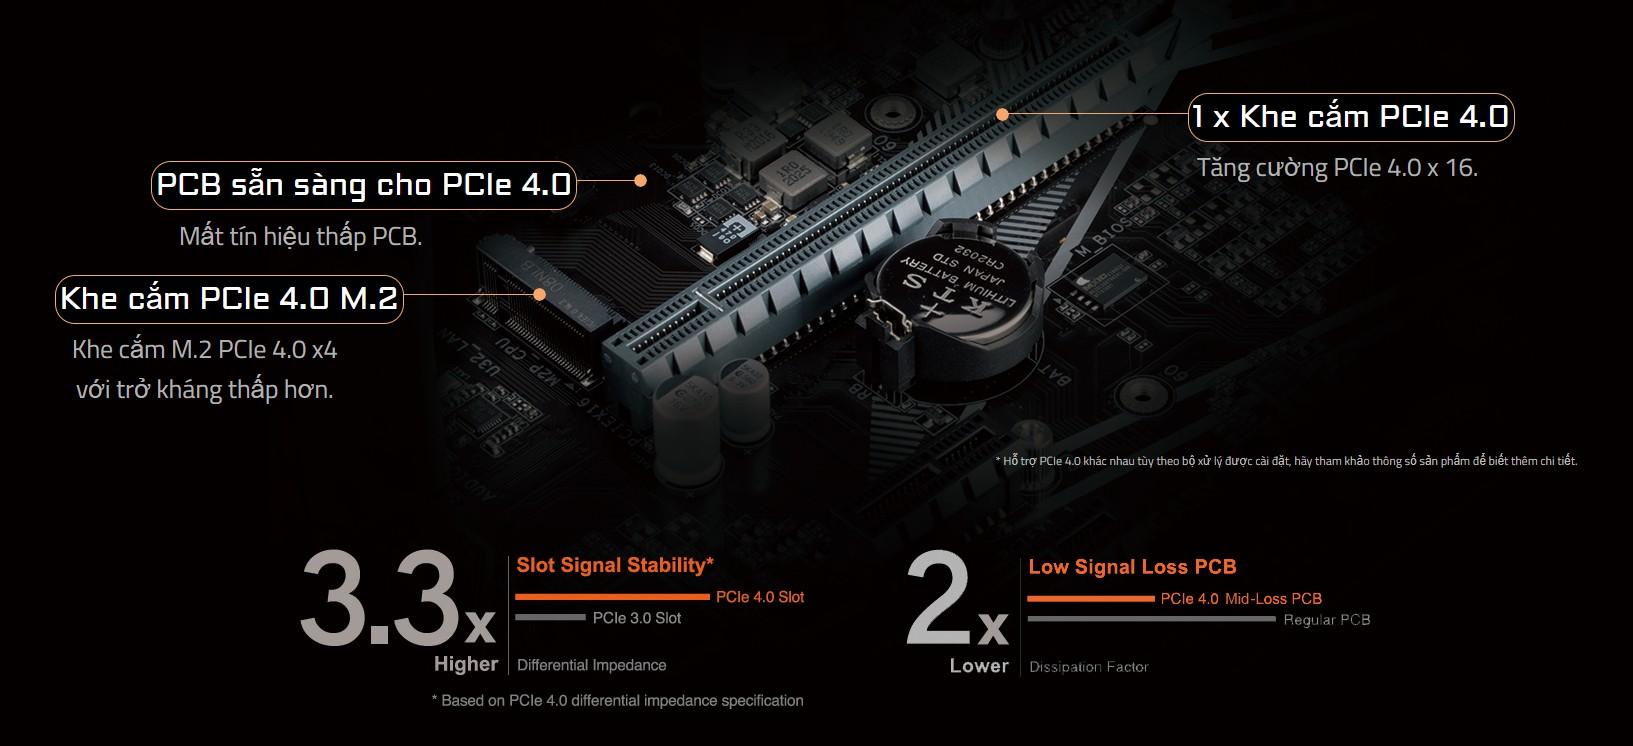 THIẾT KẾ PCLE 4.0